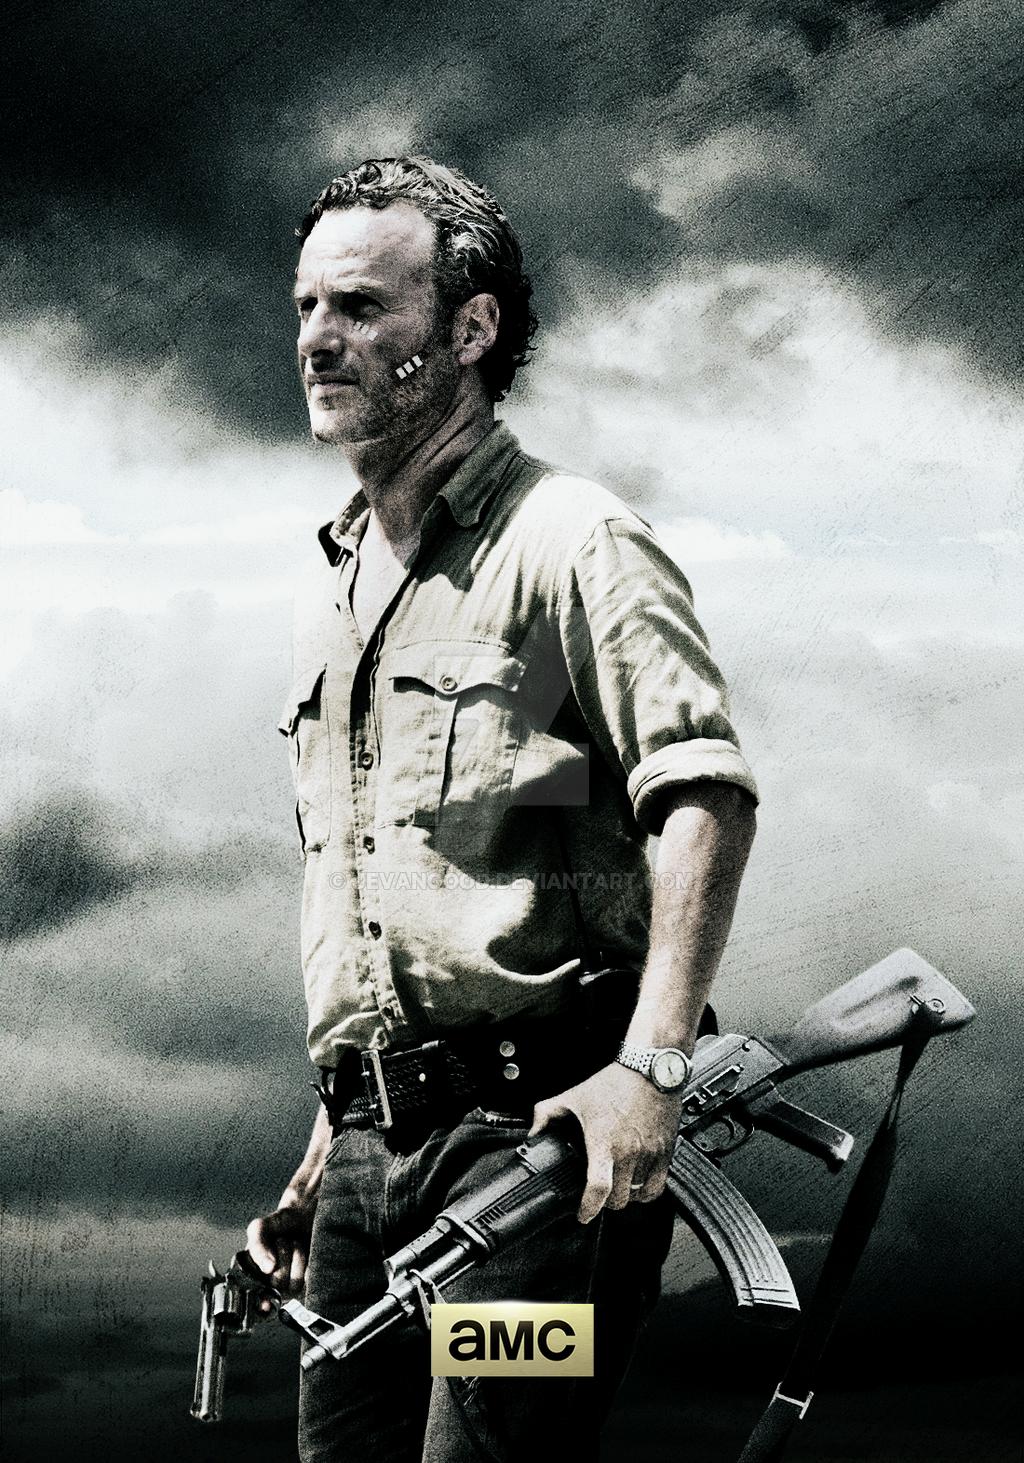 Rick Grimes Season 1 Wallpaper